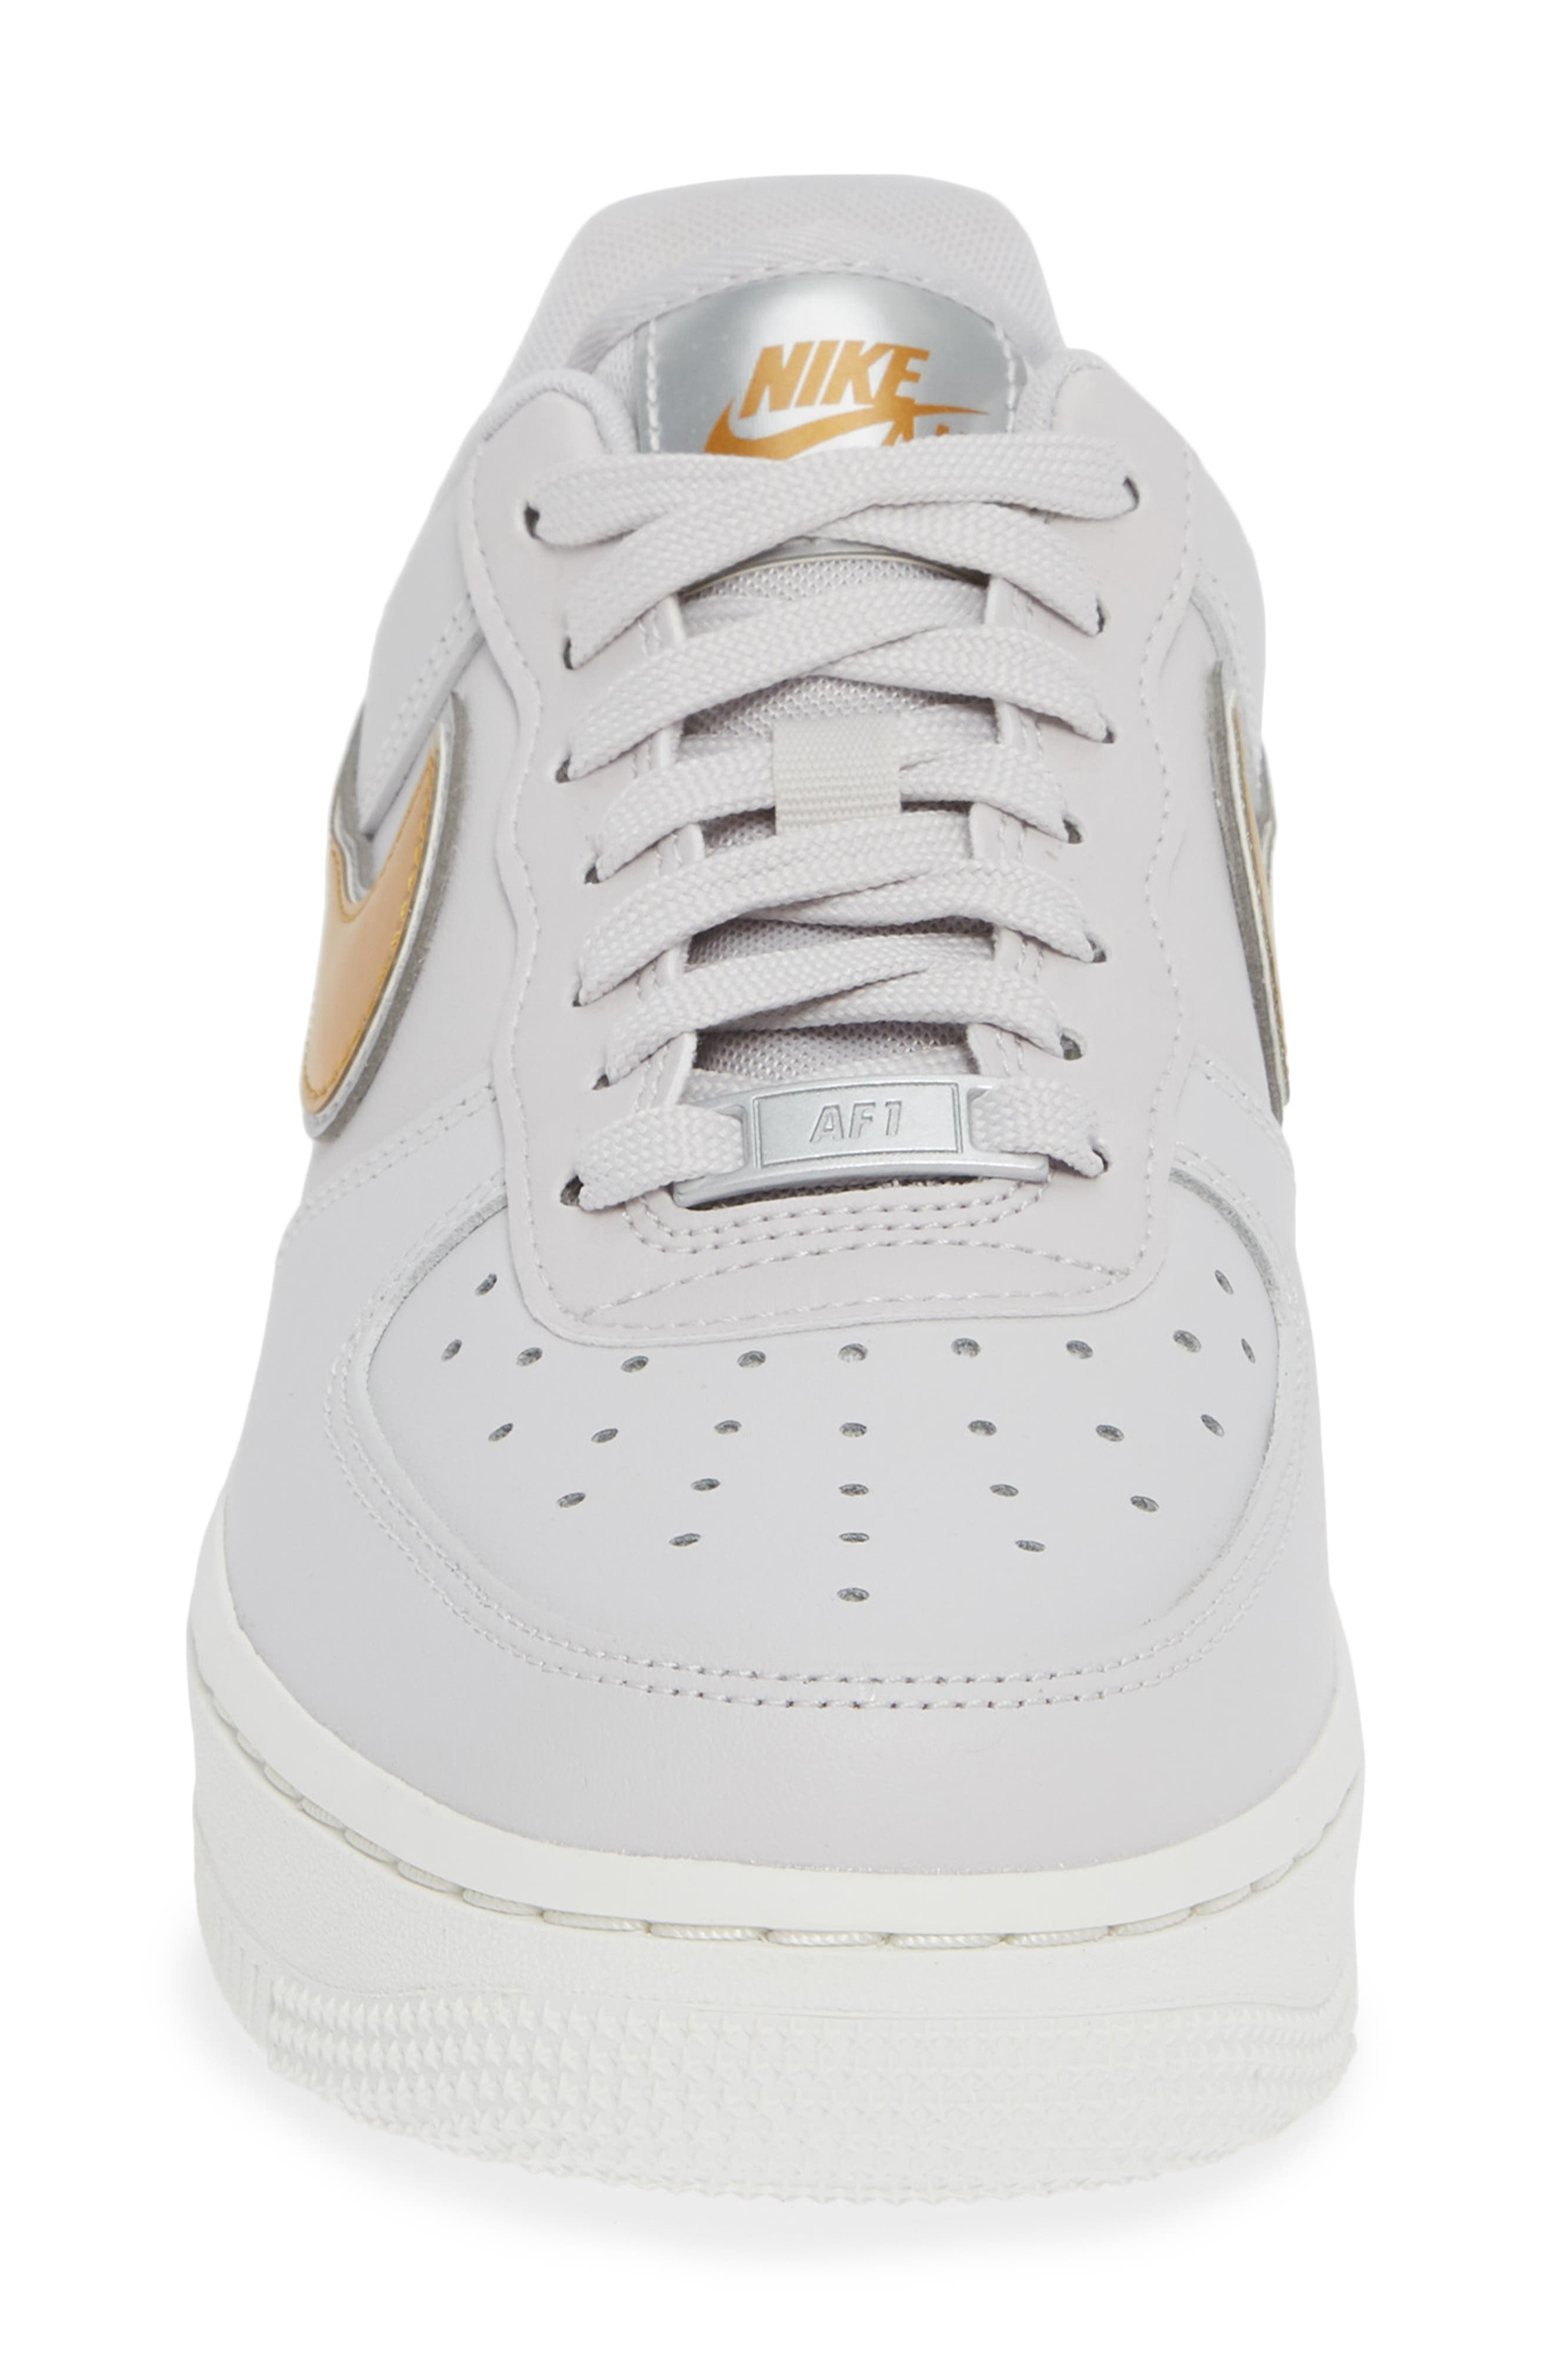 Air Force 1 '07 Premium Sneaker,                             Alternate thumbnail 4, color,                             GREY/ METALLIC GOLD- WHITE